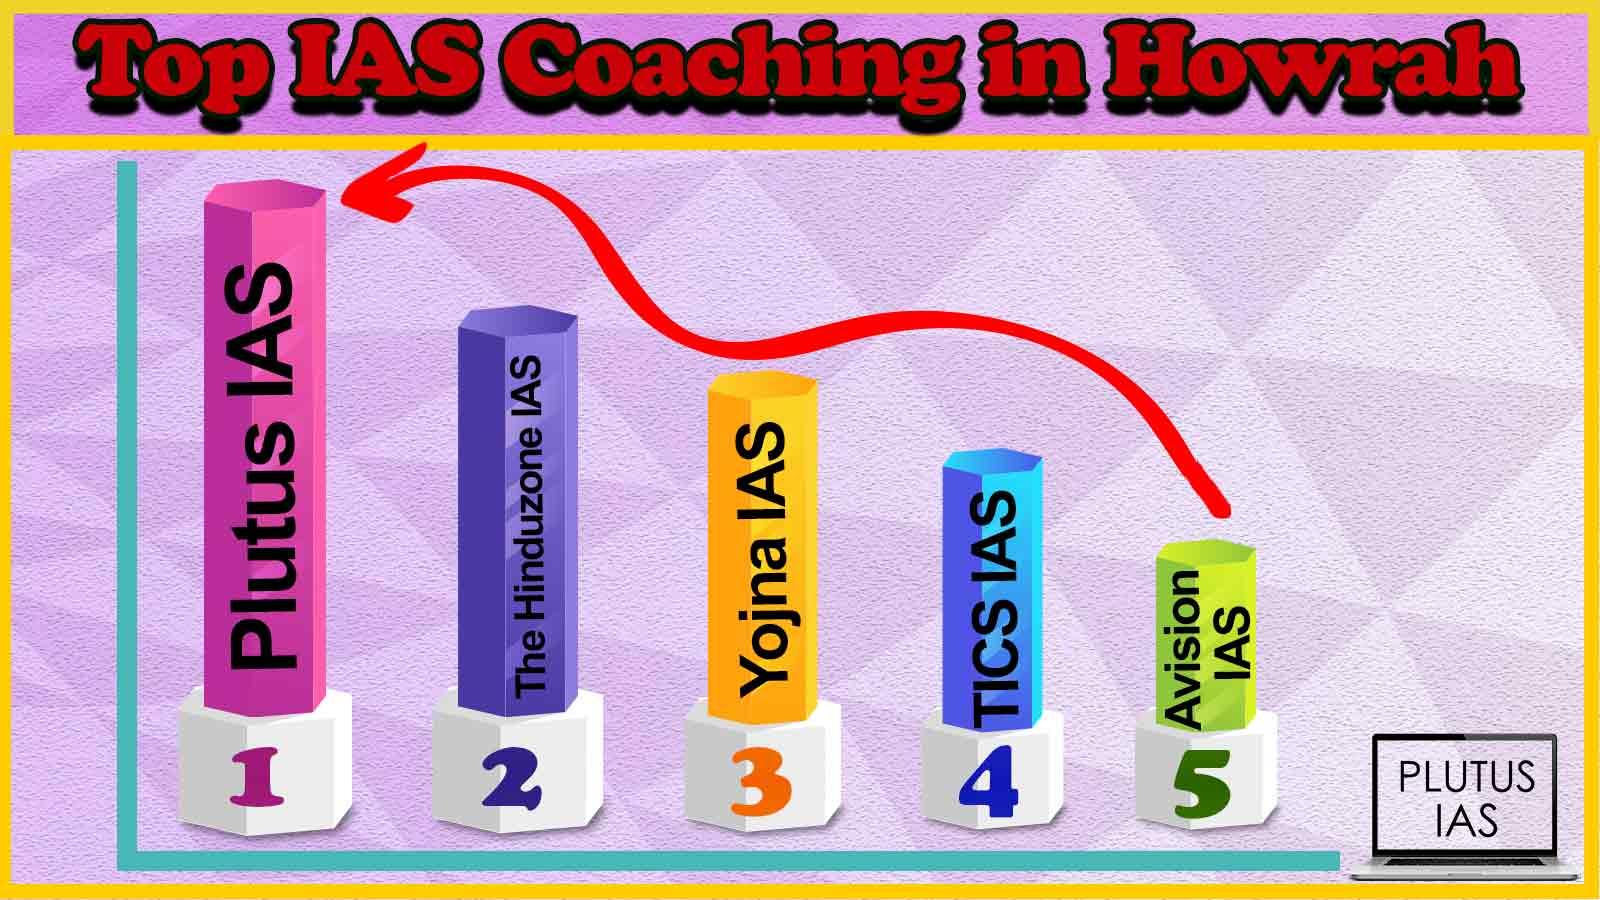 Best 10 IAS Coaching Howrah